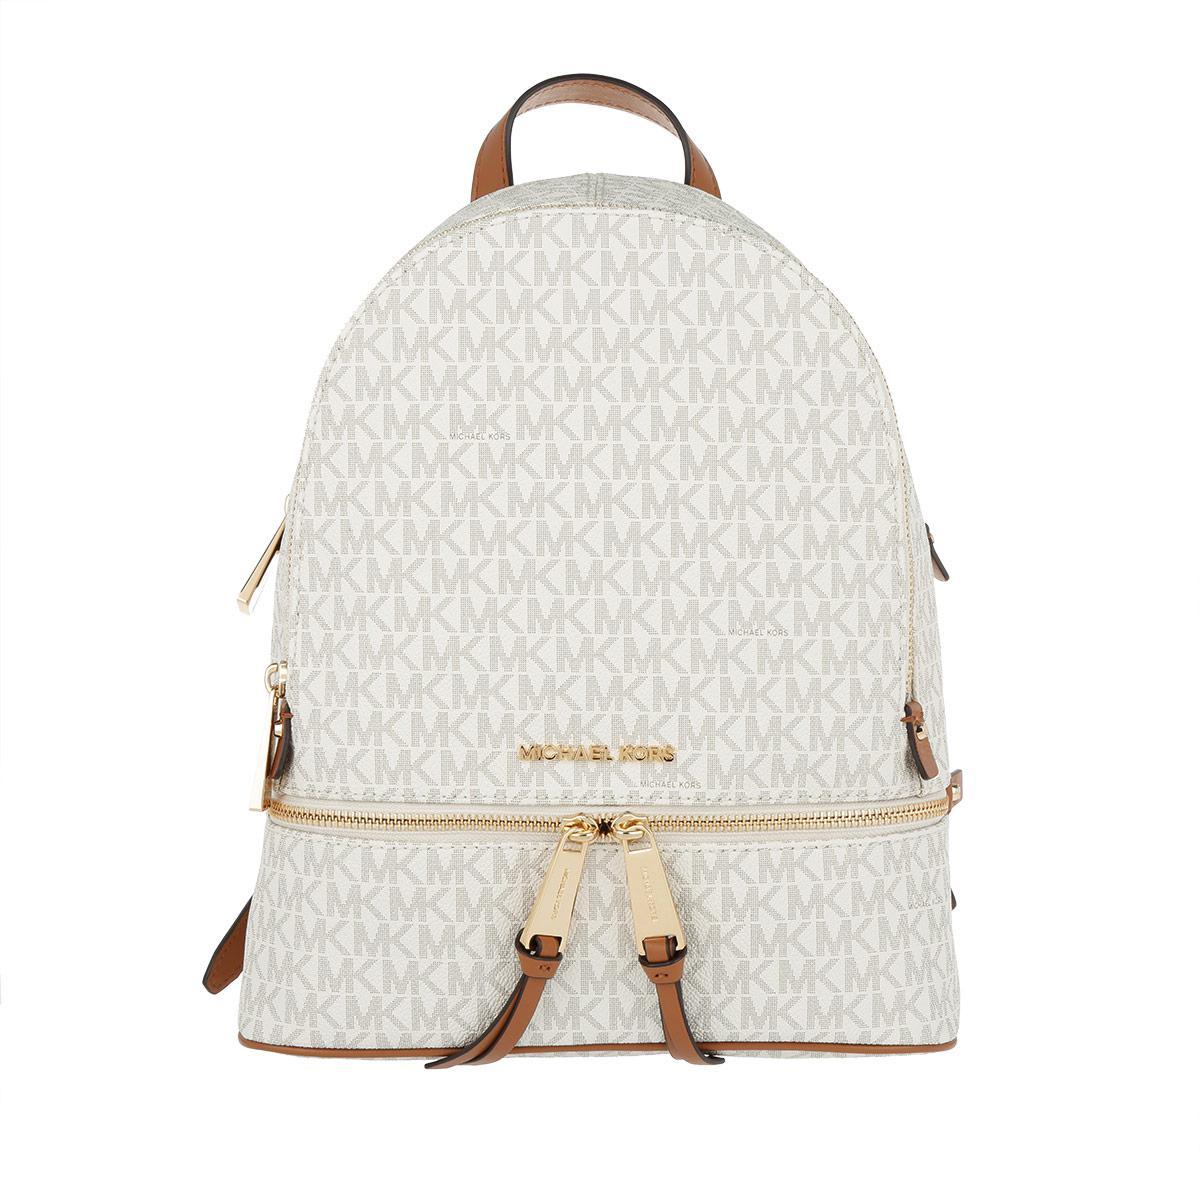 4eba86b3450df Michael Kors Rhea Zip Md Backpack Vanilla in White - Lyst